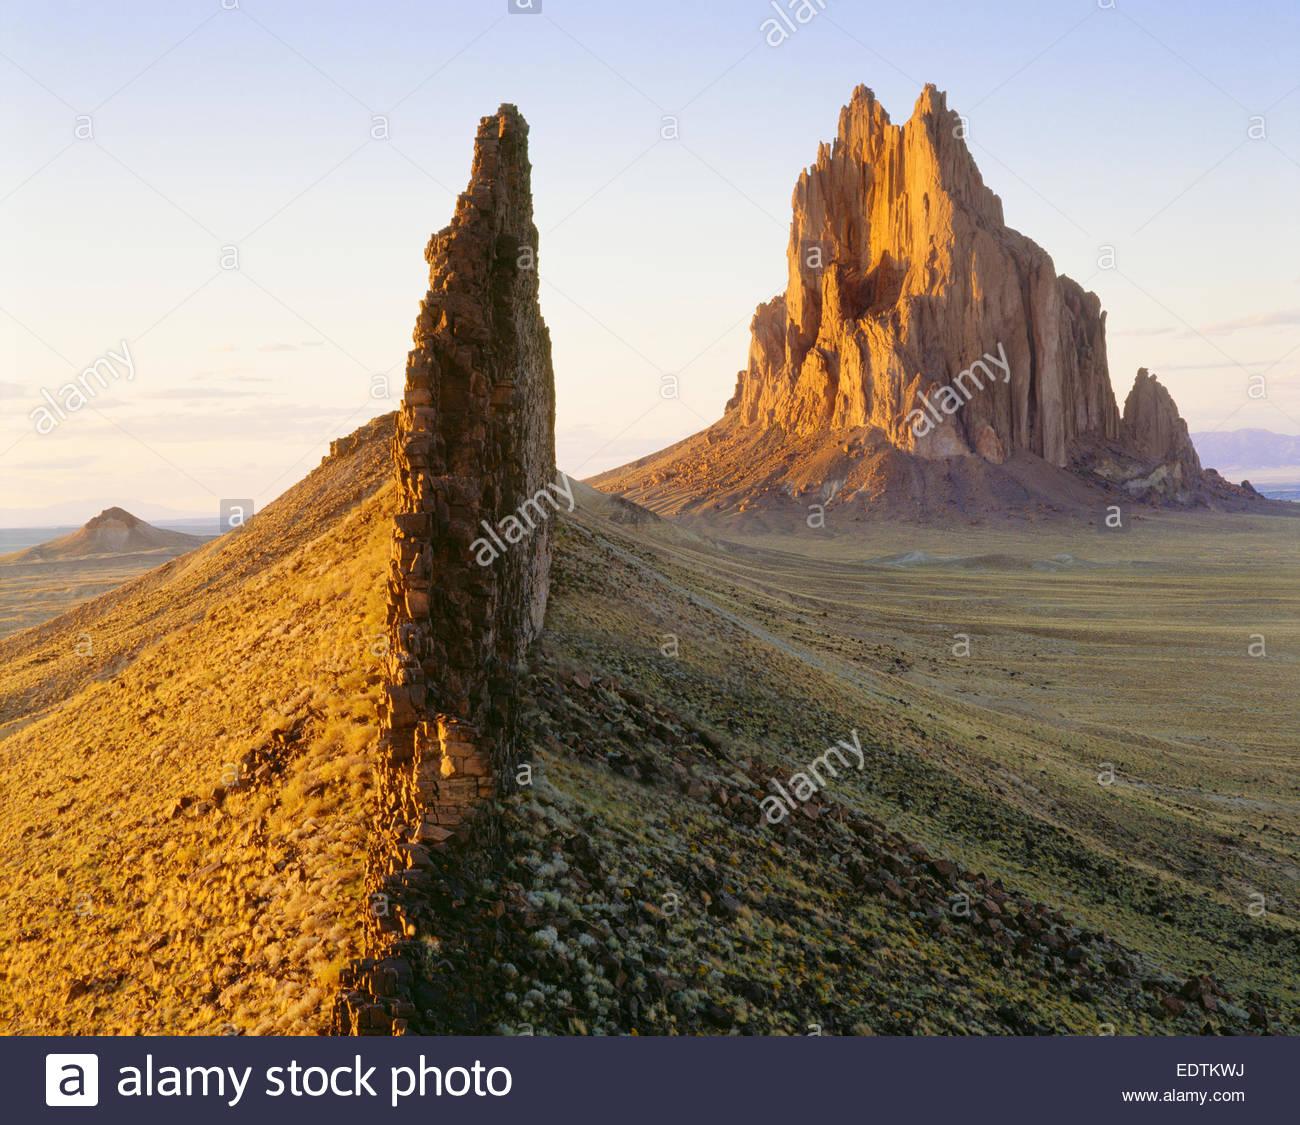 Shiprock, 1100 pies de alto monolito volcánica, conectado con el dique volcánico. Reservación de Imagen De Stock